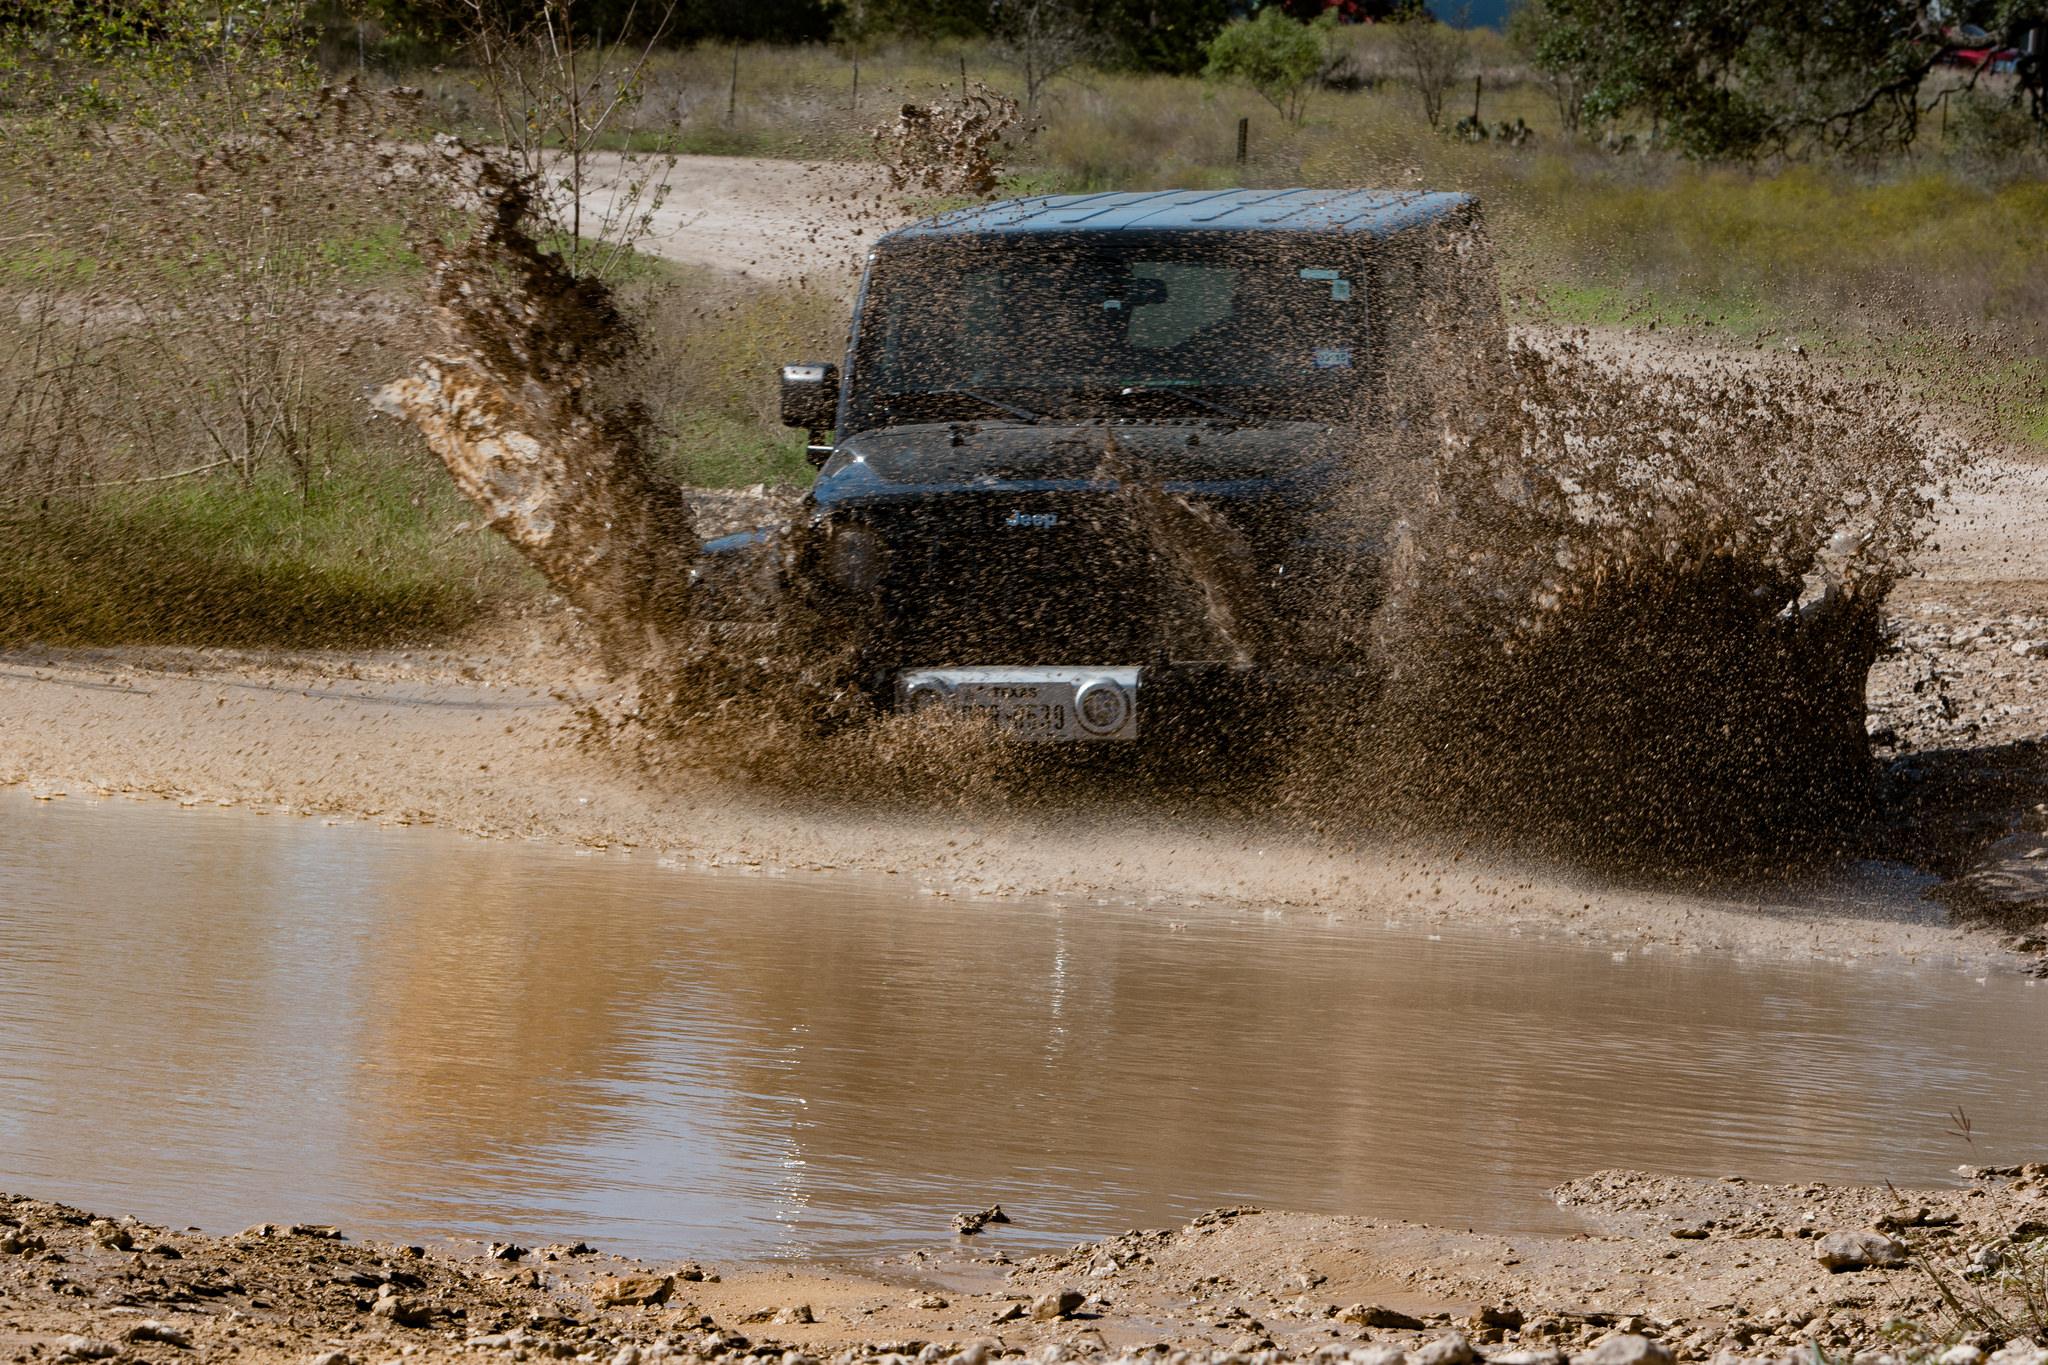 Black Jeep in Mud | © Nan Palmero/Flickr